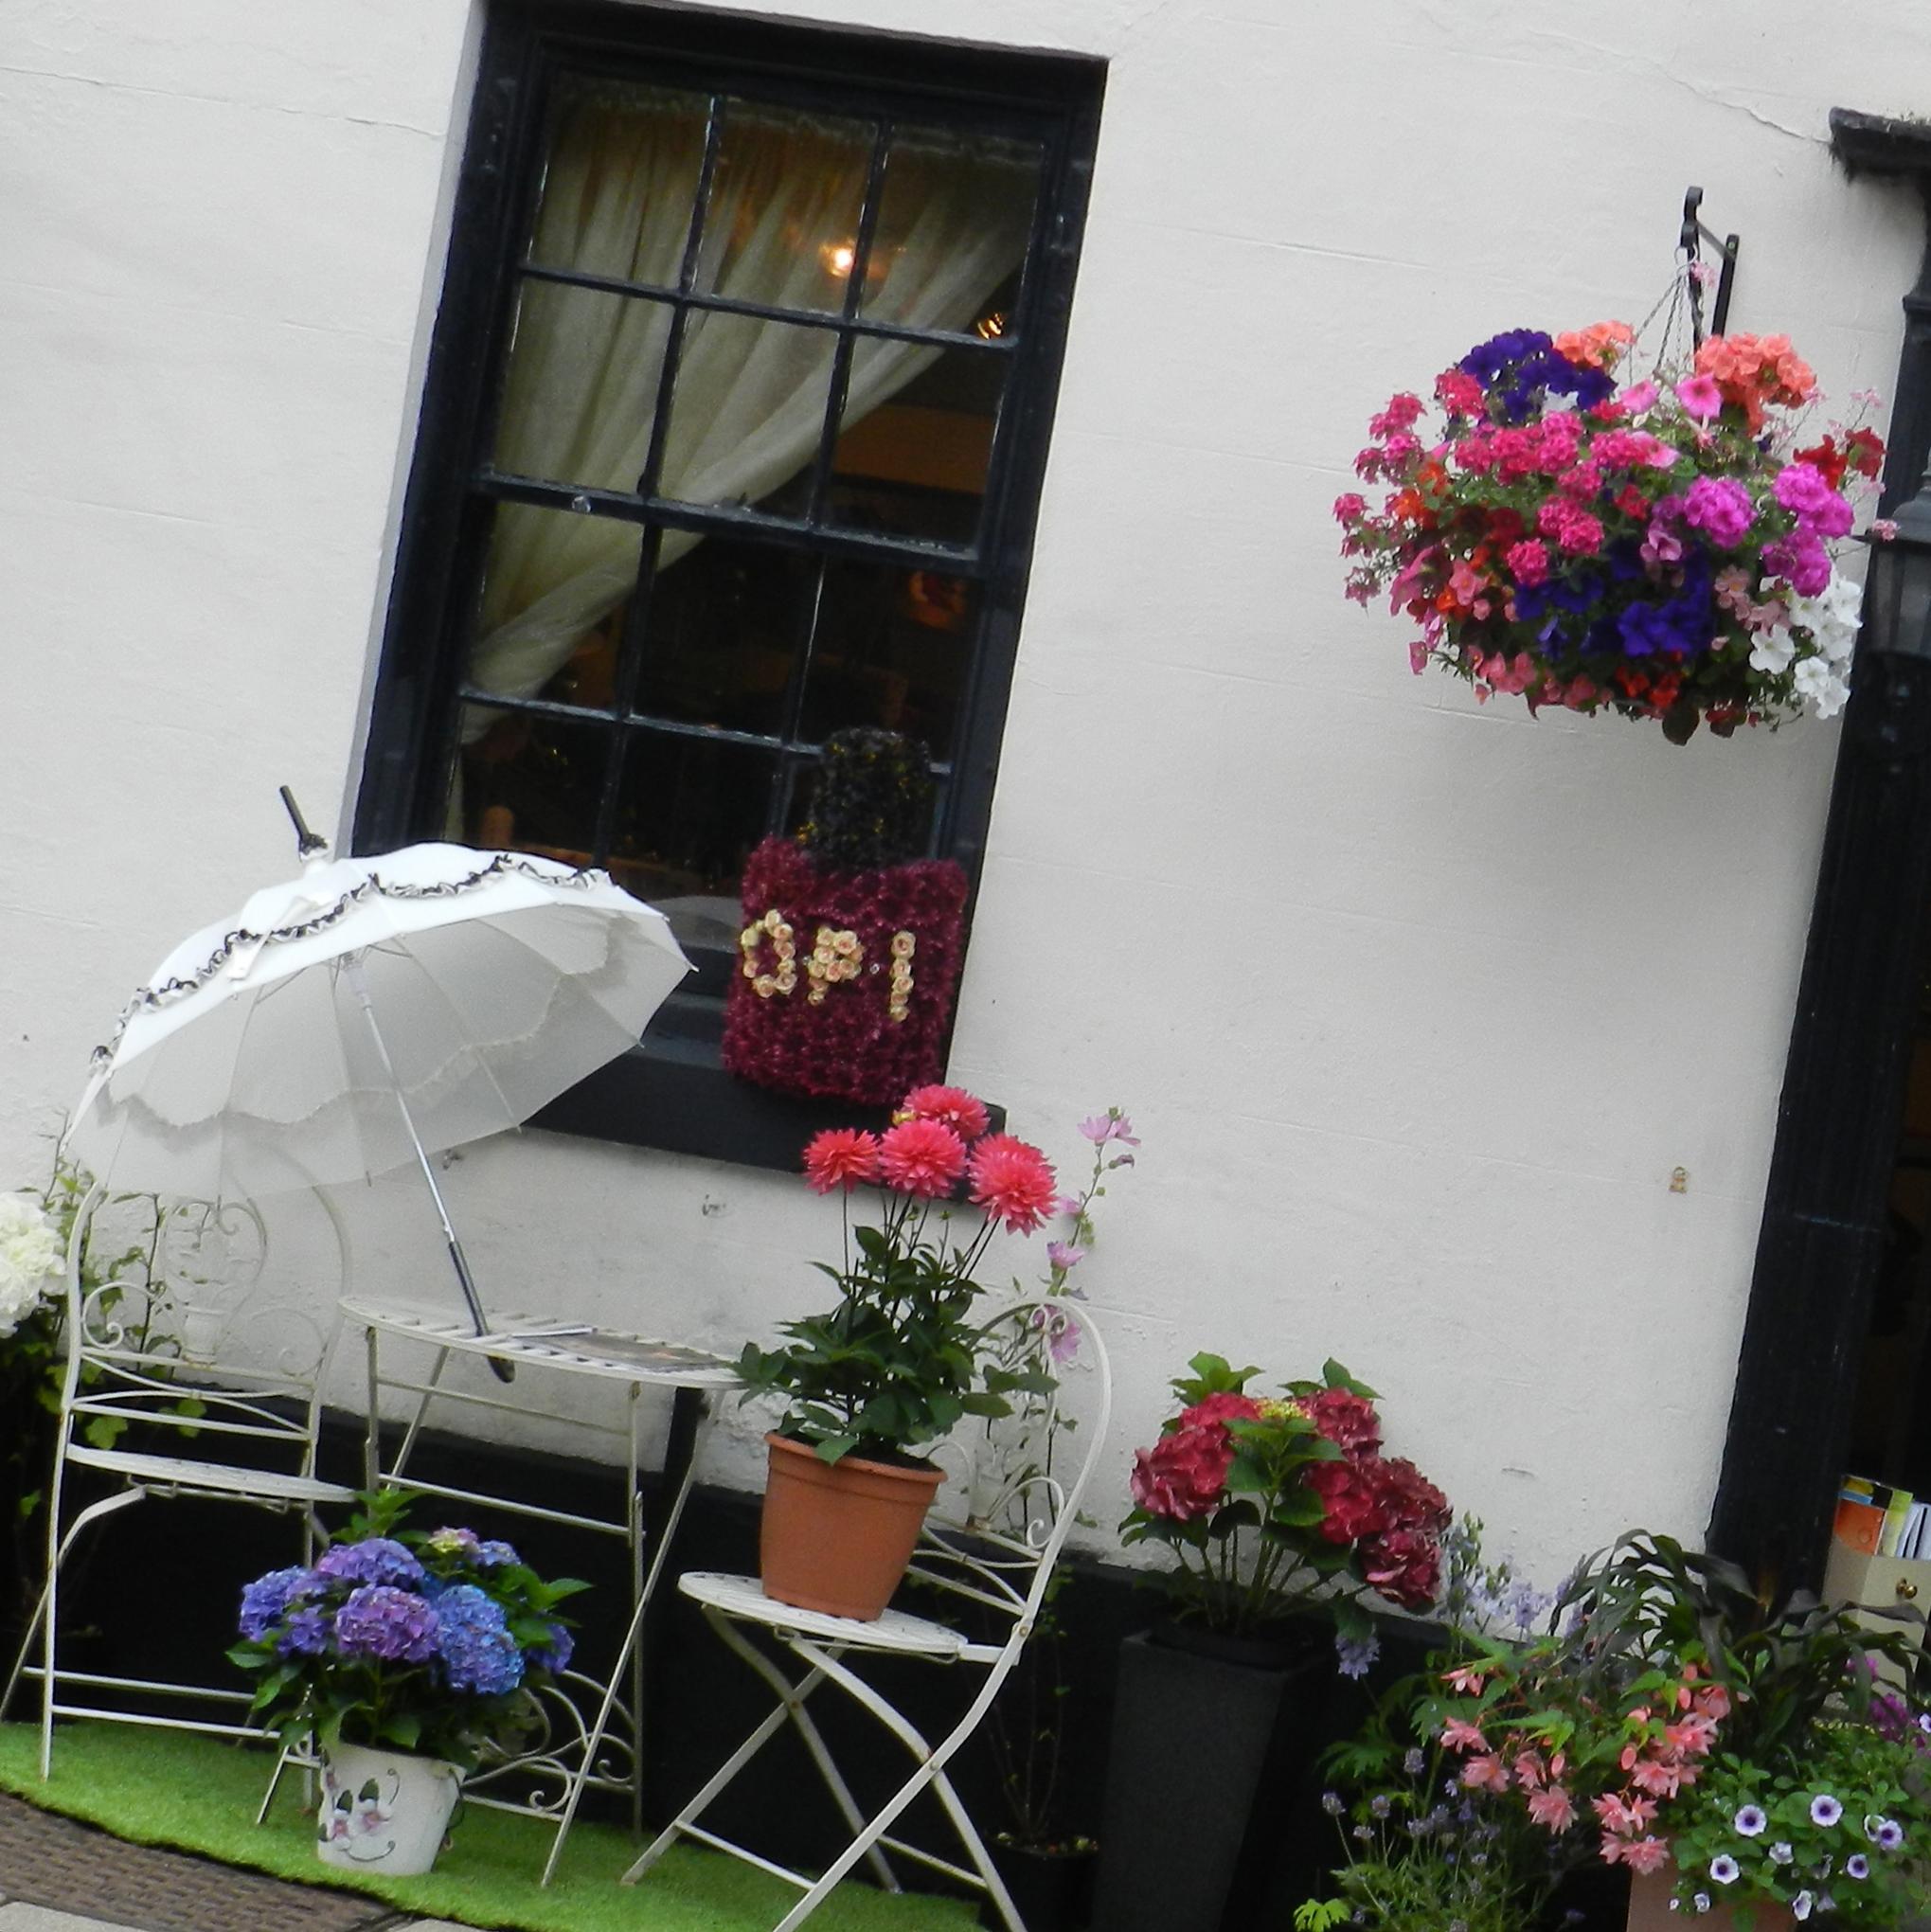 Knutsford bloom florist flower delivery and floral displays portfolio izmirmasajfo